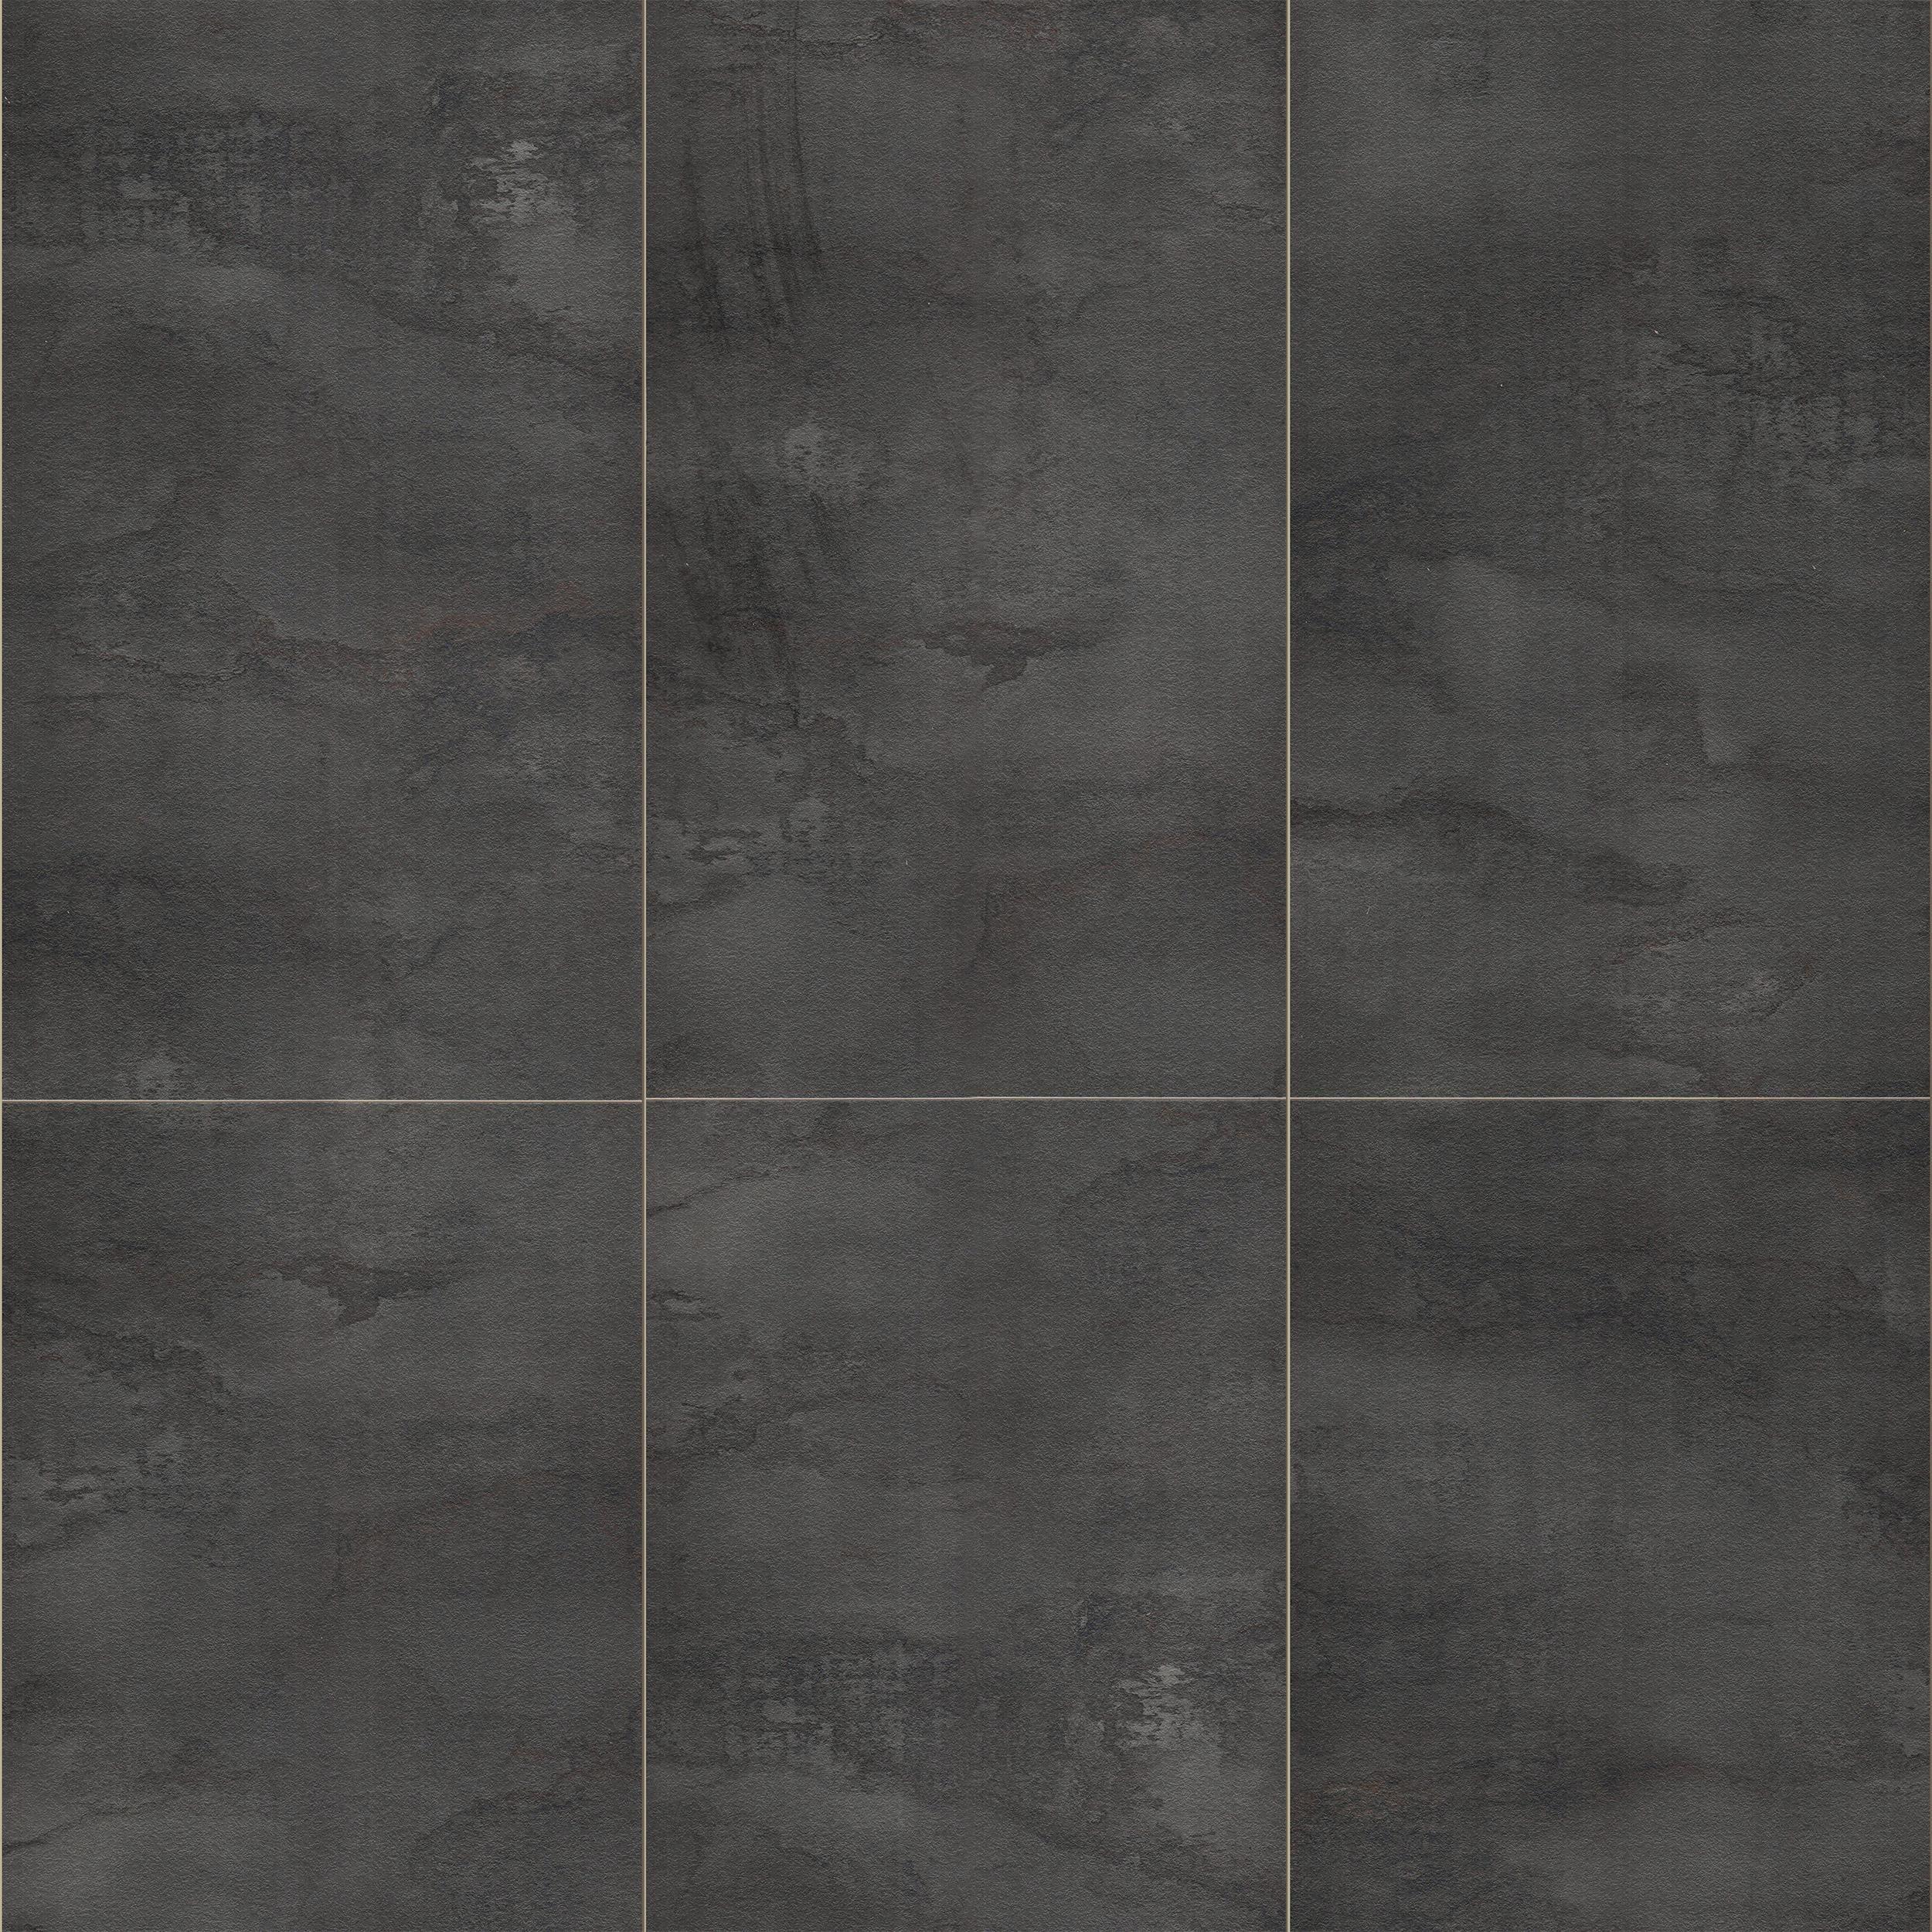 Kronoswiss Mega Tile Cardiff Waterproof Laminate Flooring Laminate Flooring Laminate Flooring Waterproof Laminate Flooring Flooring